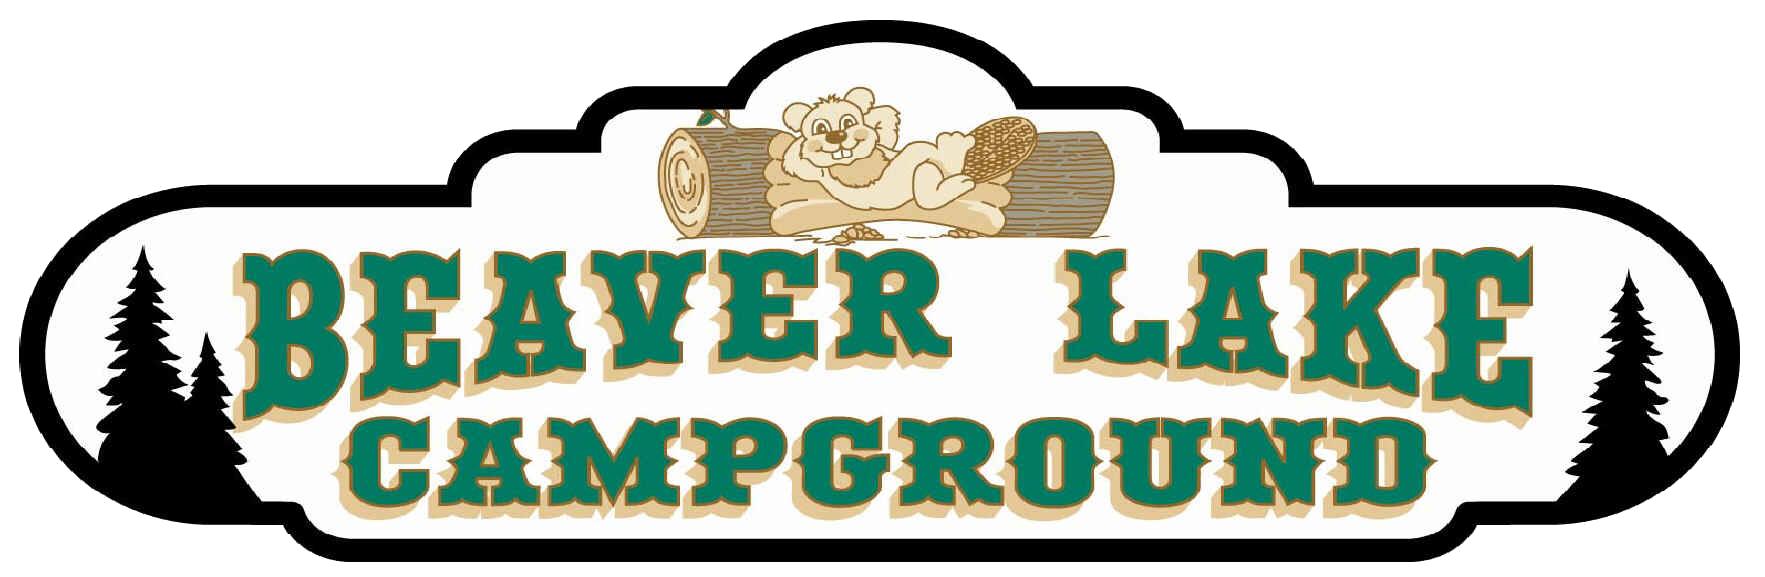 Map beaver logo. Lake clipart campground